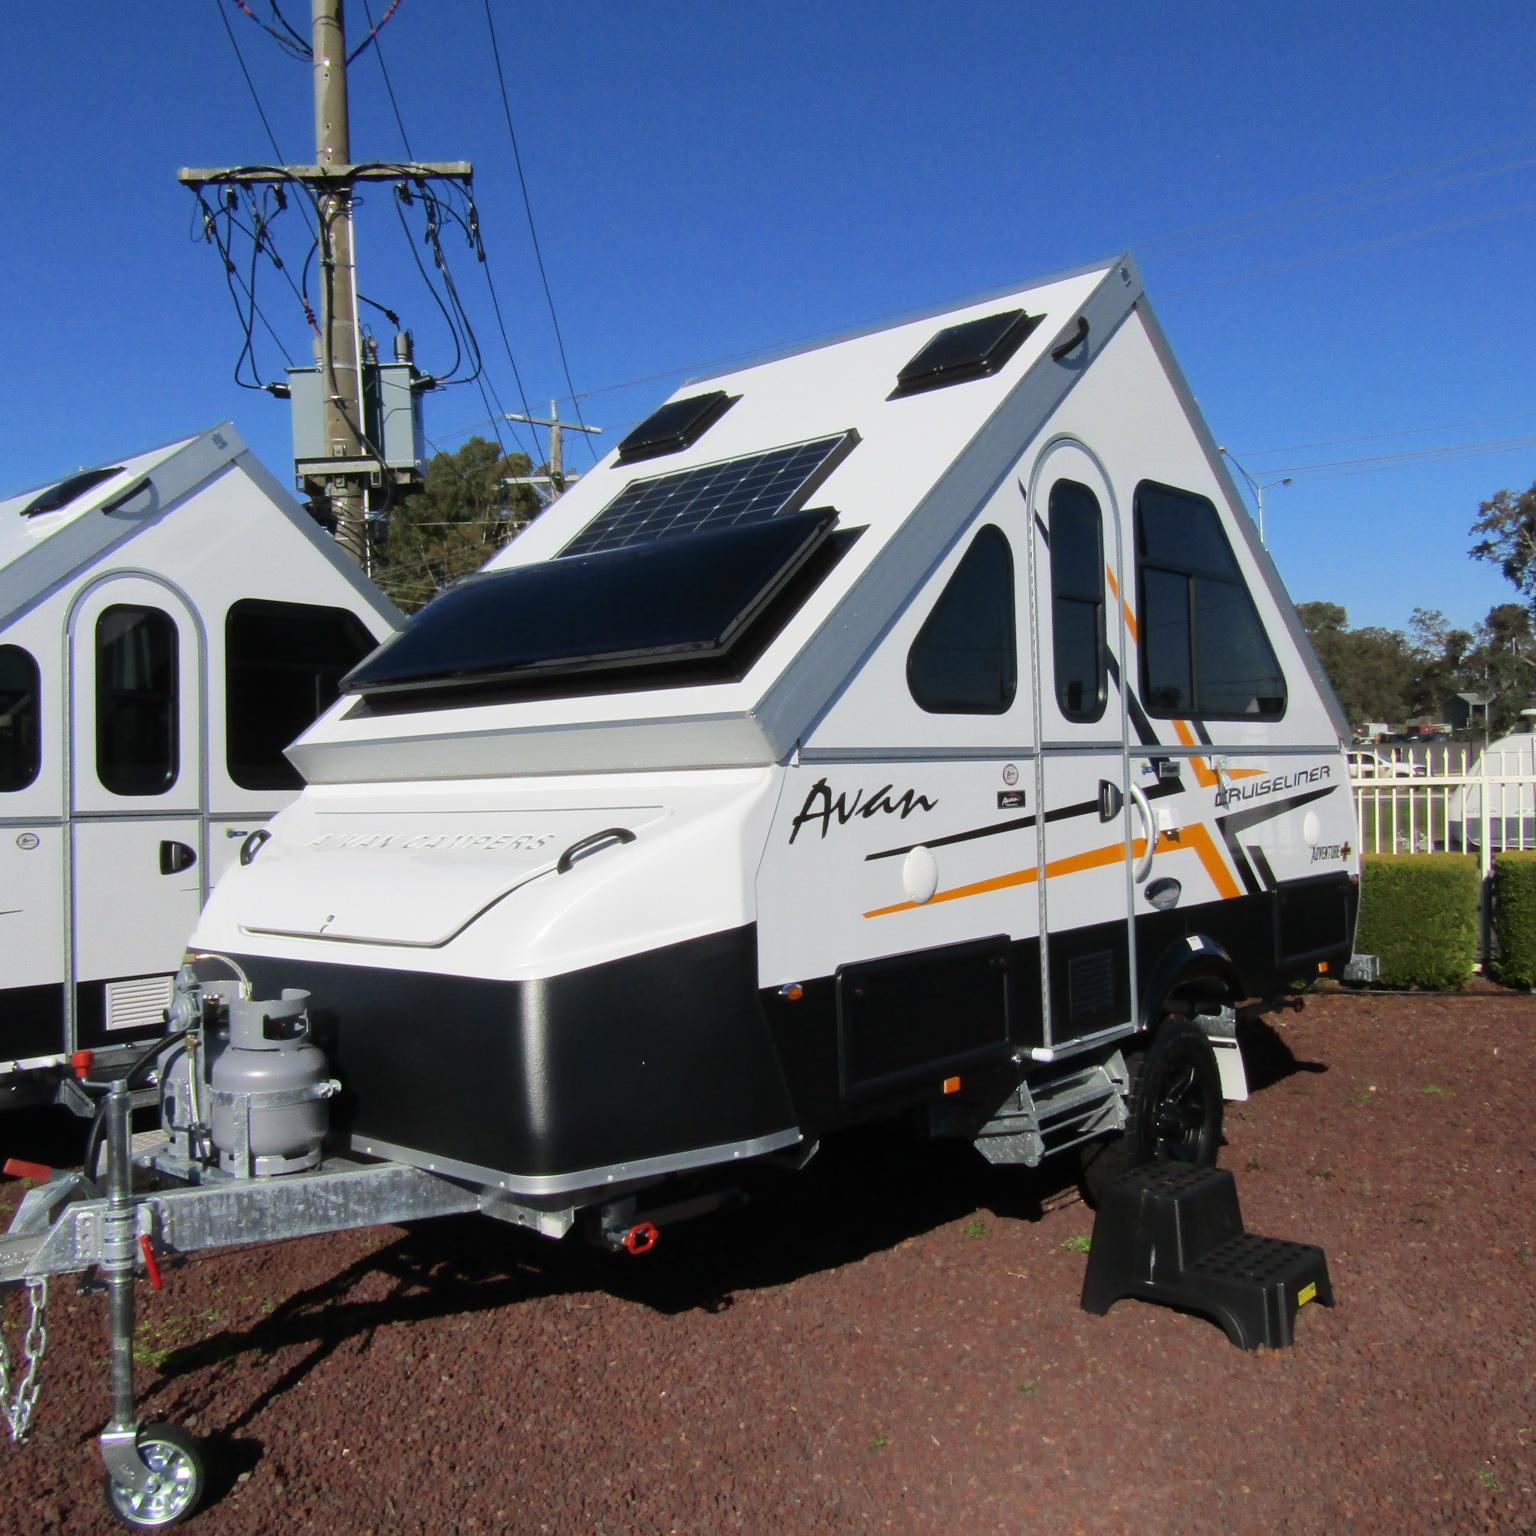 Donehues Leisure NEW Avan Cruiseliner 1D Adventure pack Plus Camper Hamilton 12349 IMG 3615